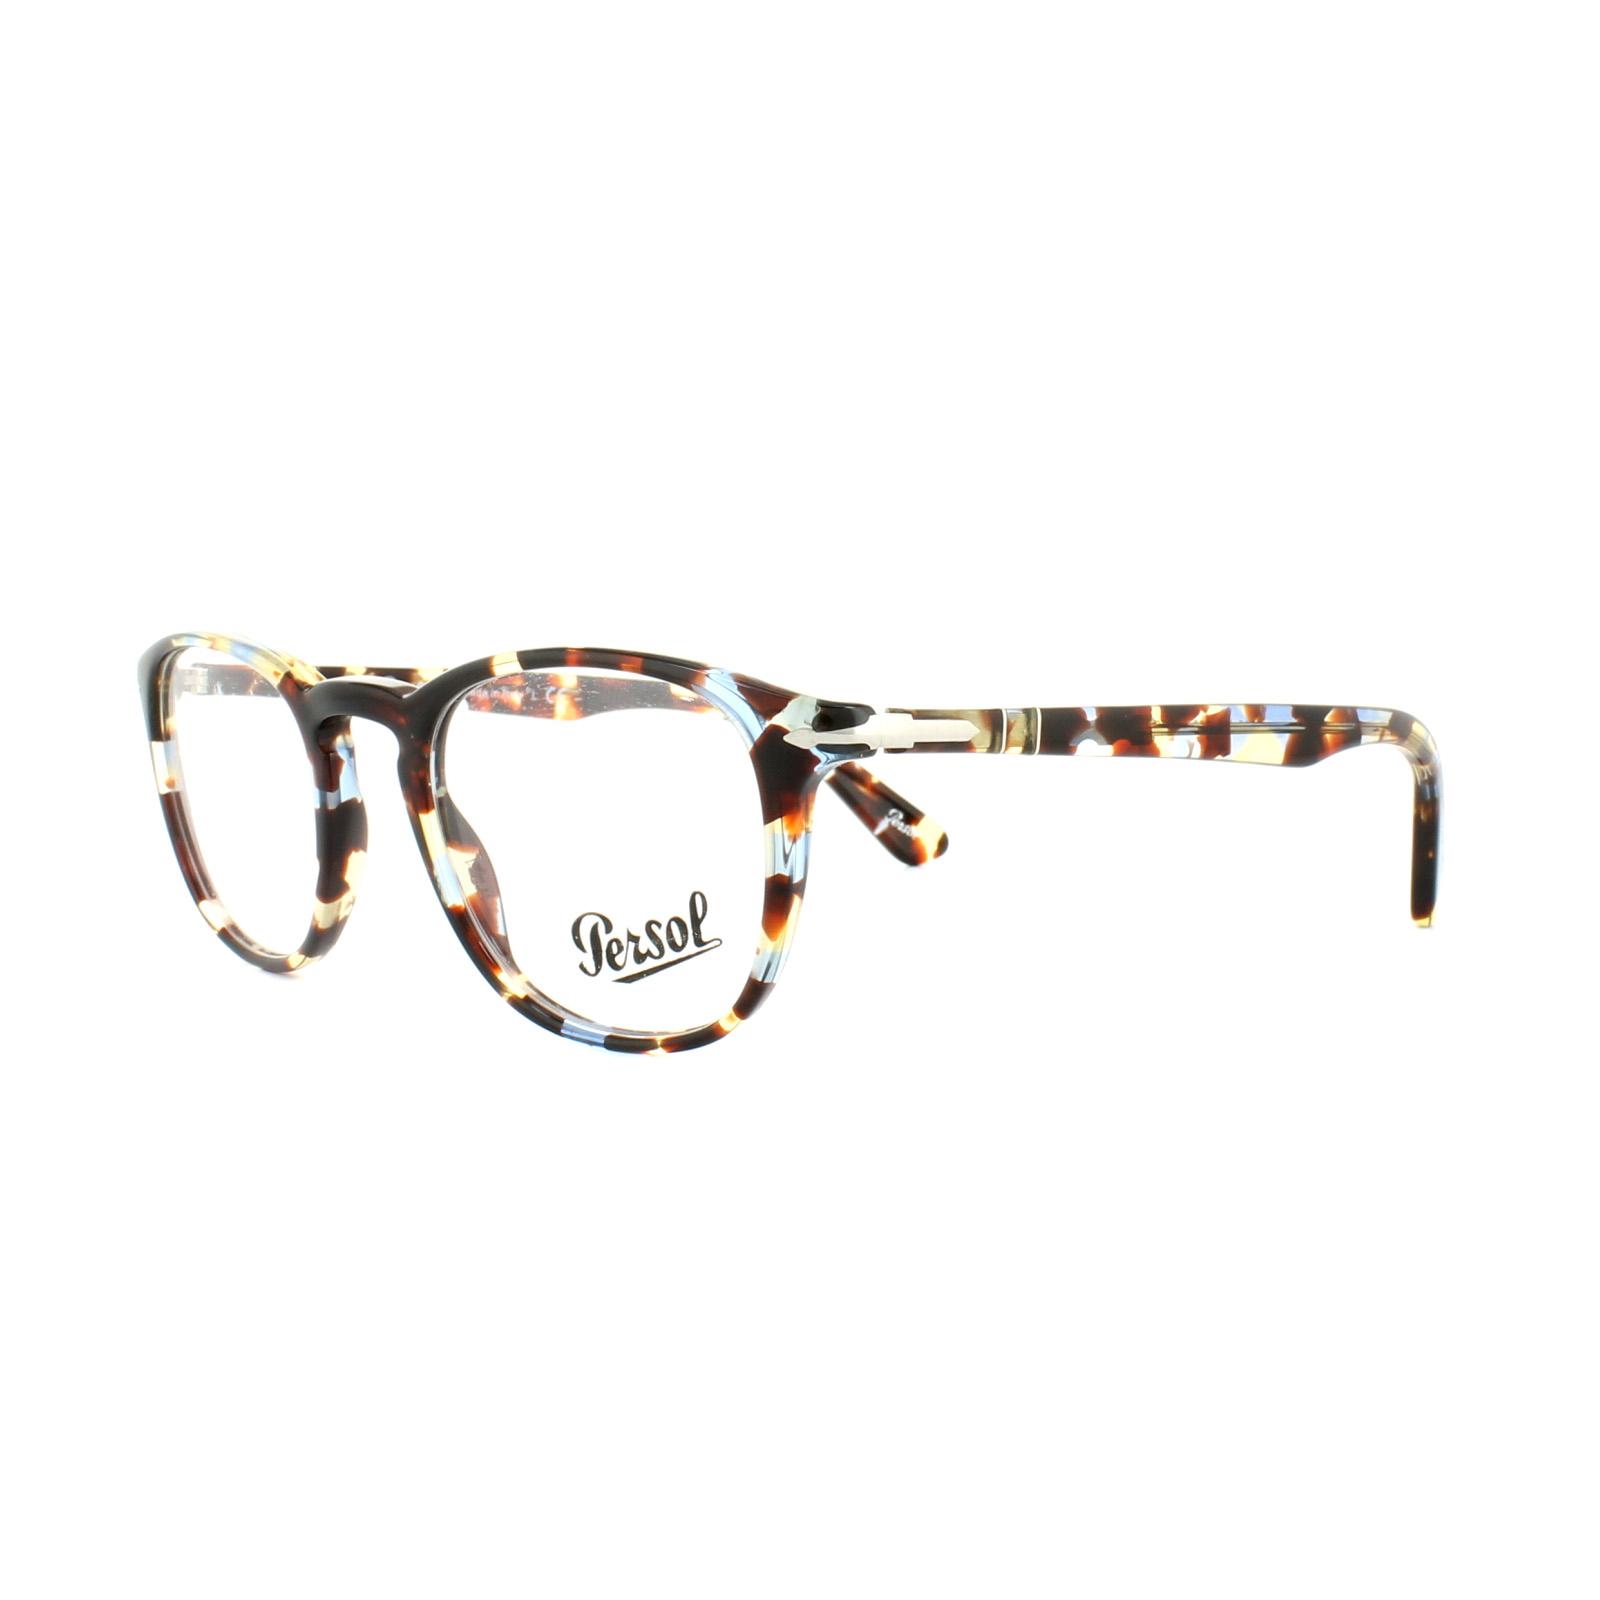 ba7df6264b Sentinel Persol Glasses Frames PO 3143V 1058 Havana Azure Brown Mens 47mm